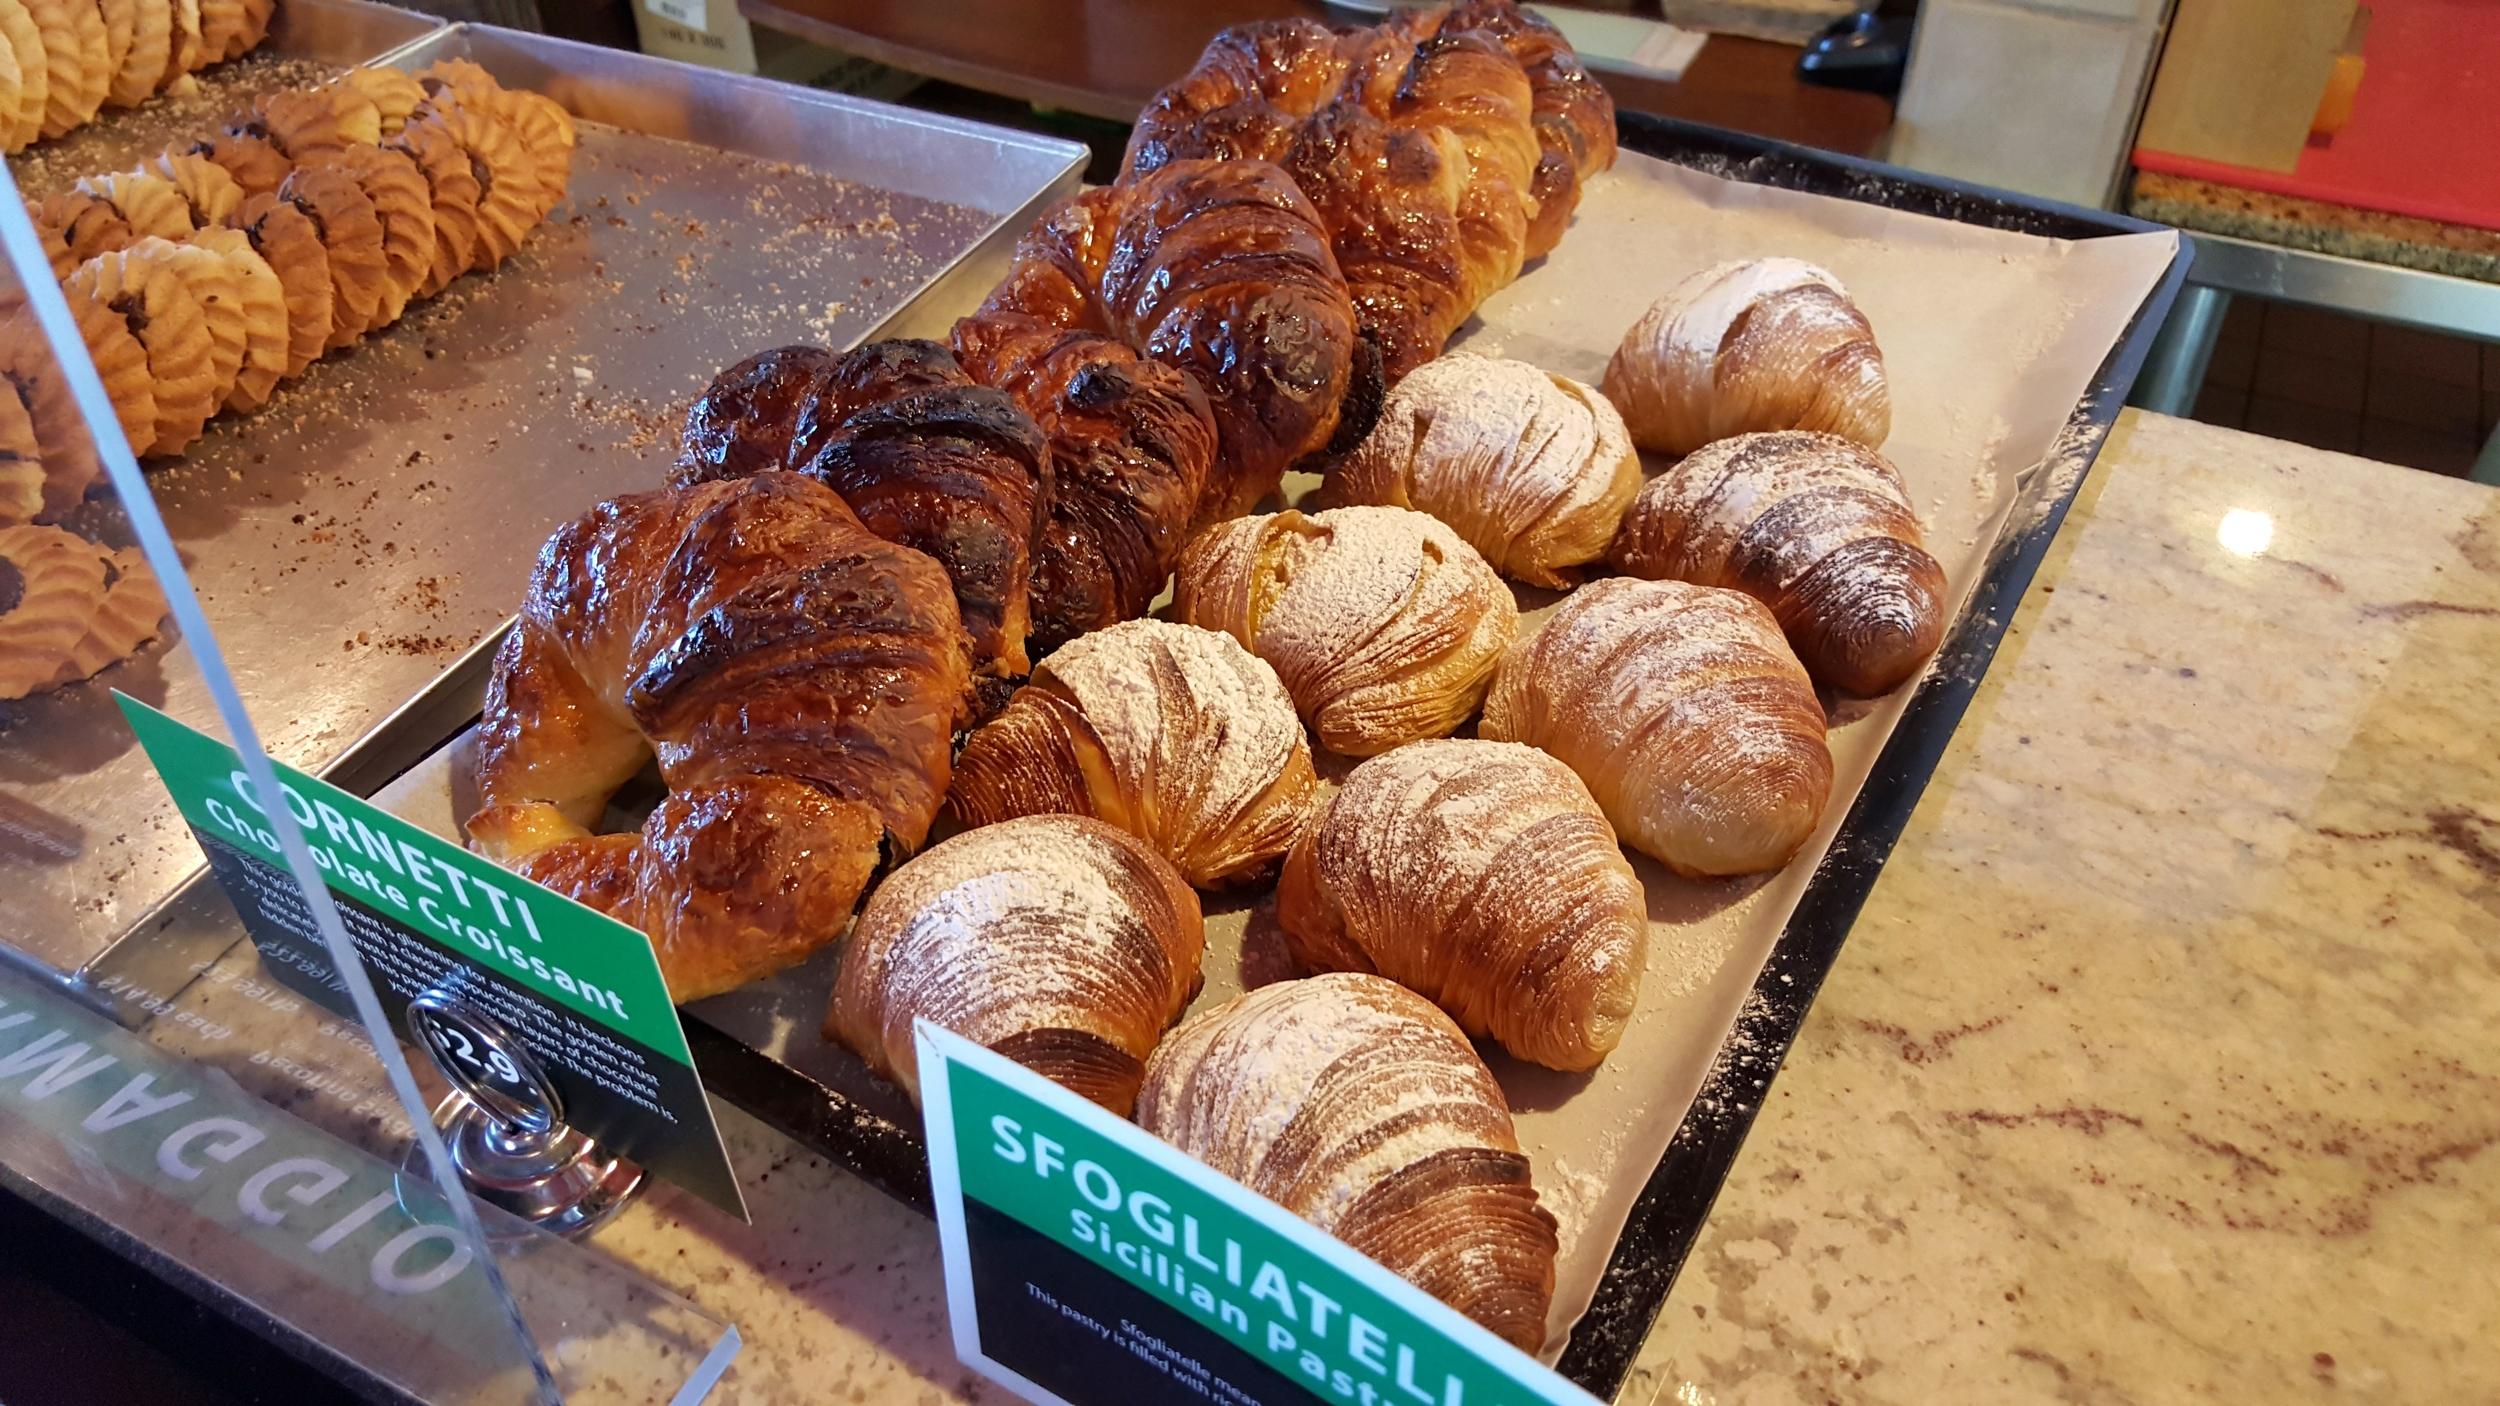 Andreoli's pastries Scottsdale